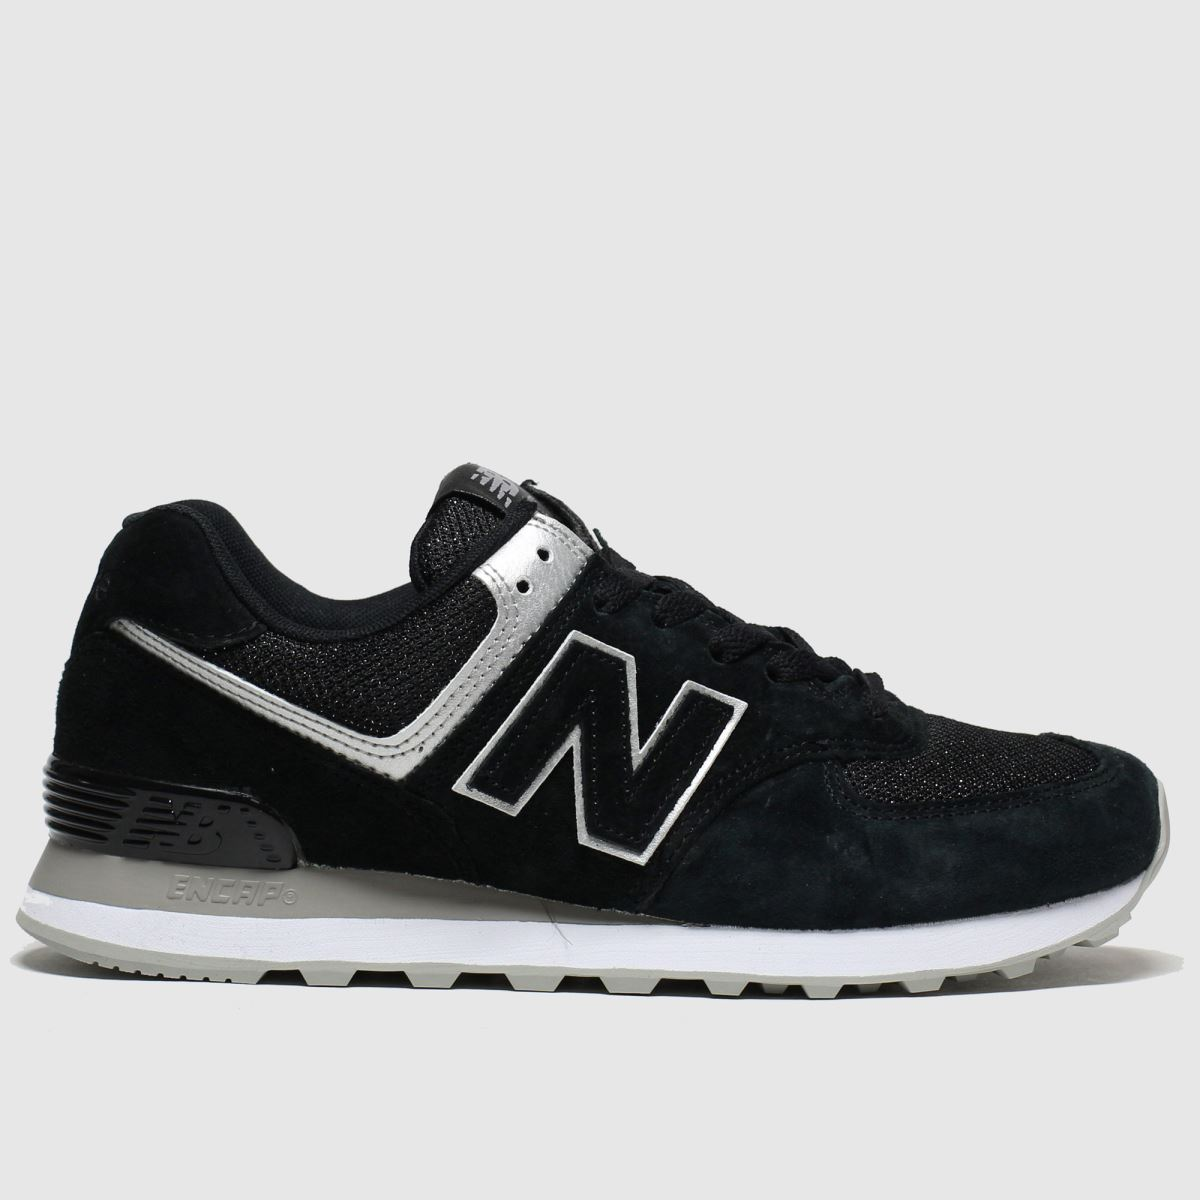 New Balance New Balance Black & Silver 574 V2 Trainers